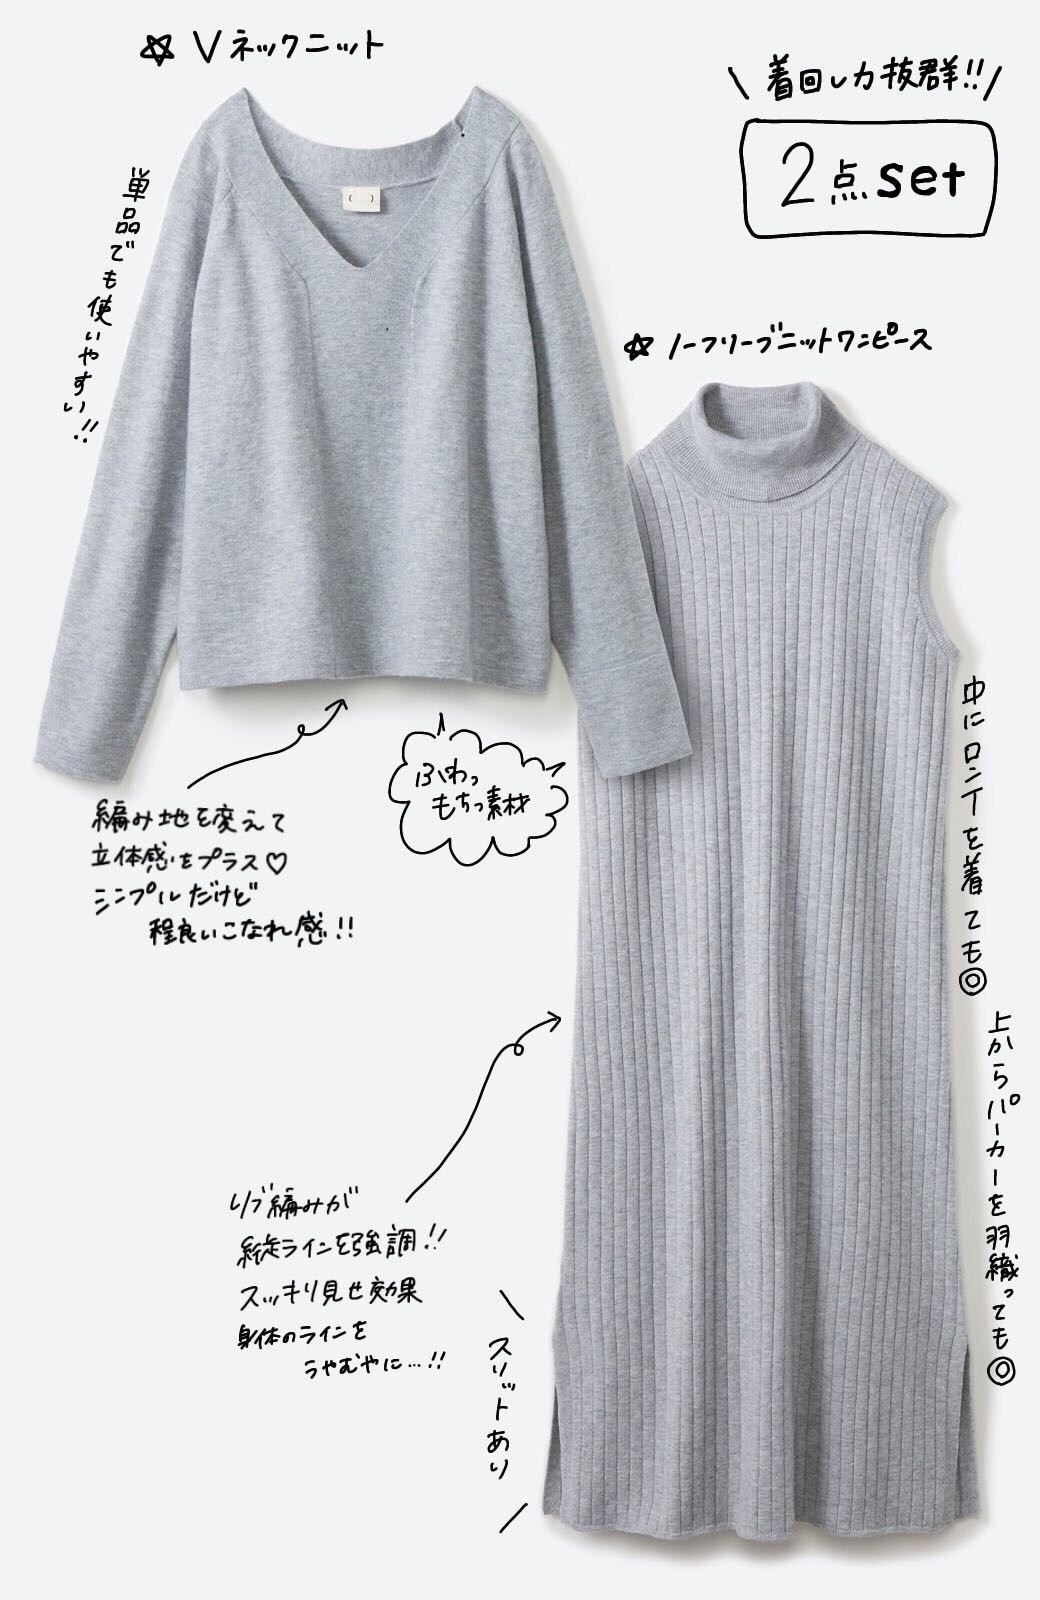 haco! セットで着るだけパッとかわいい ニットトップス&ノースリーブニットワンピースセット <グレー>の商品写真1